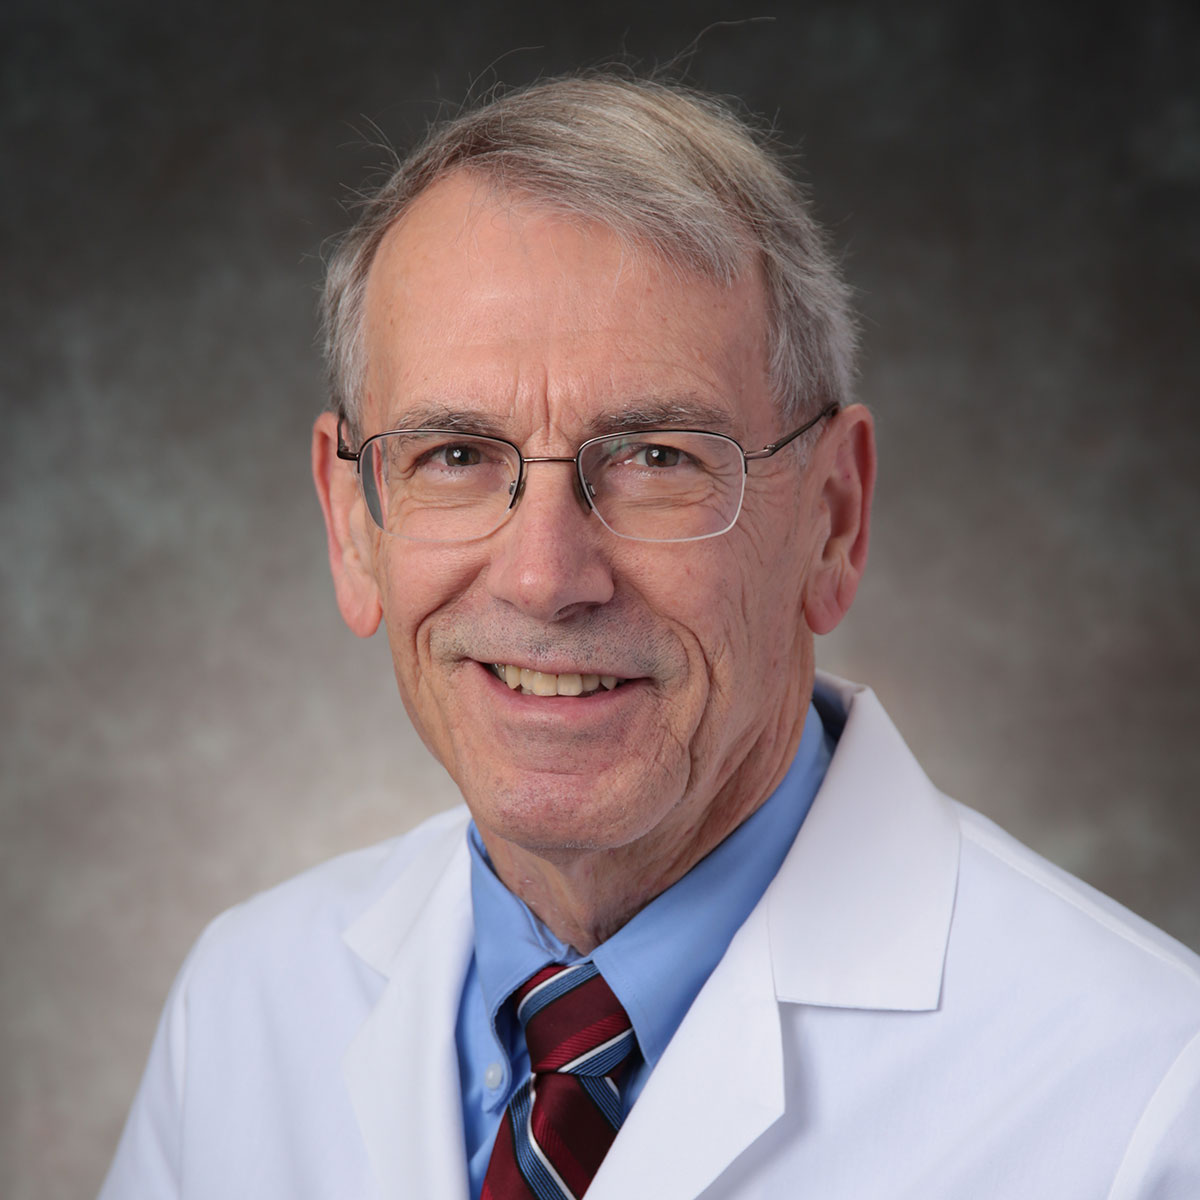 A friendly headshot of Dr. David Haburchak